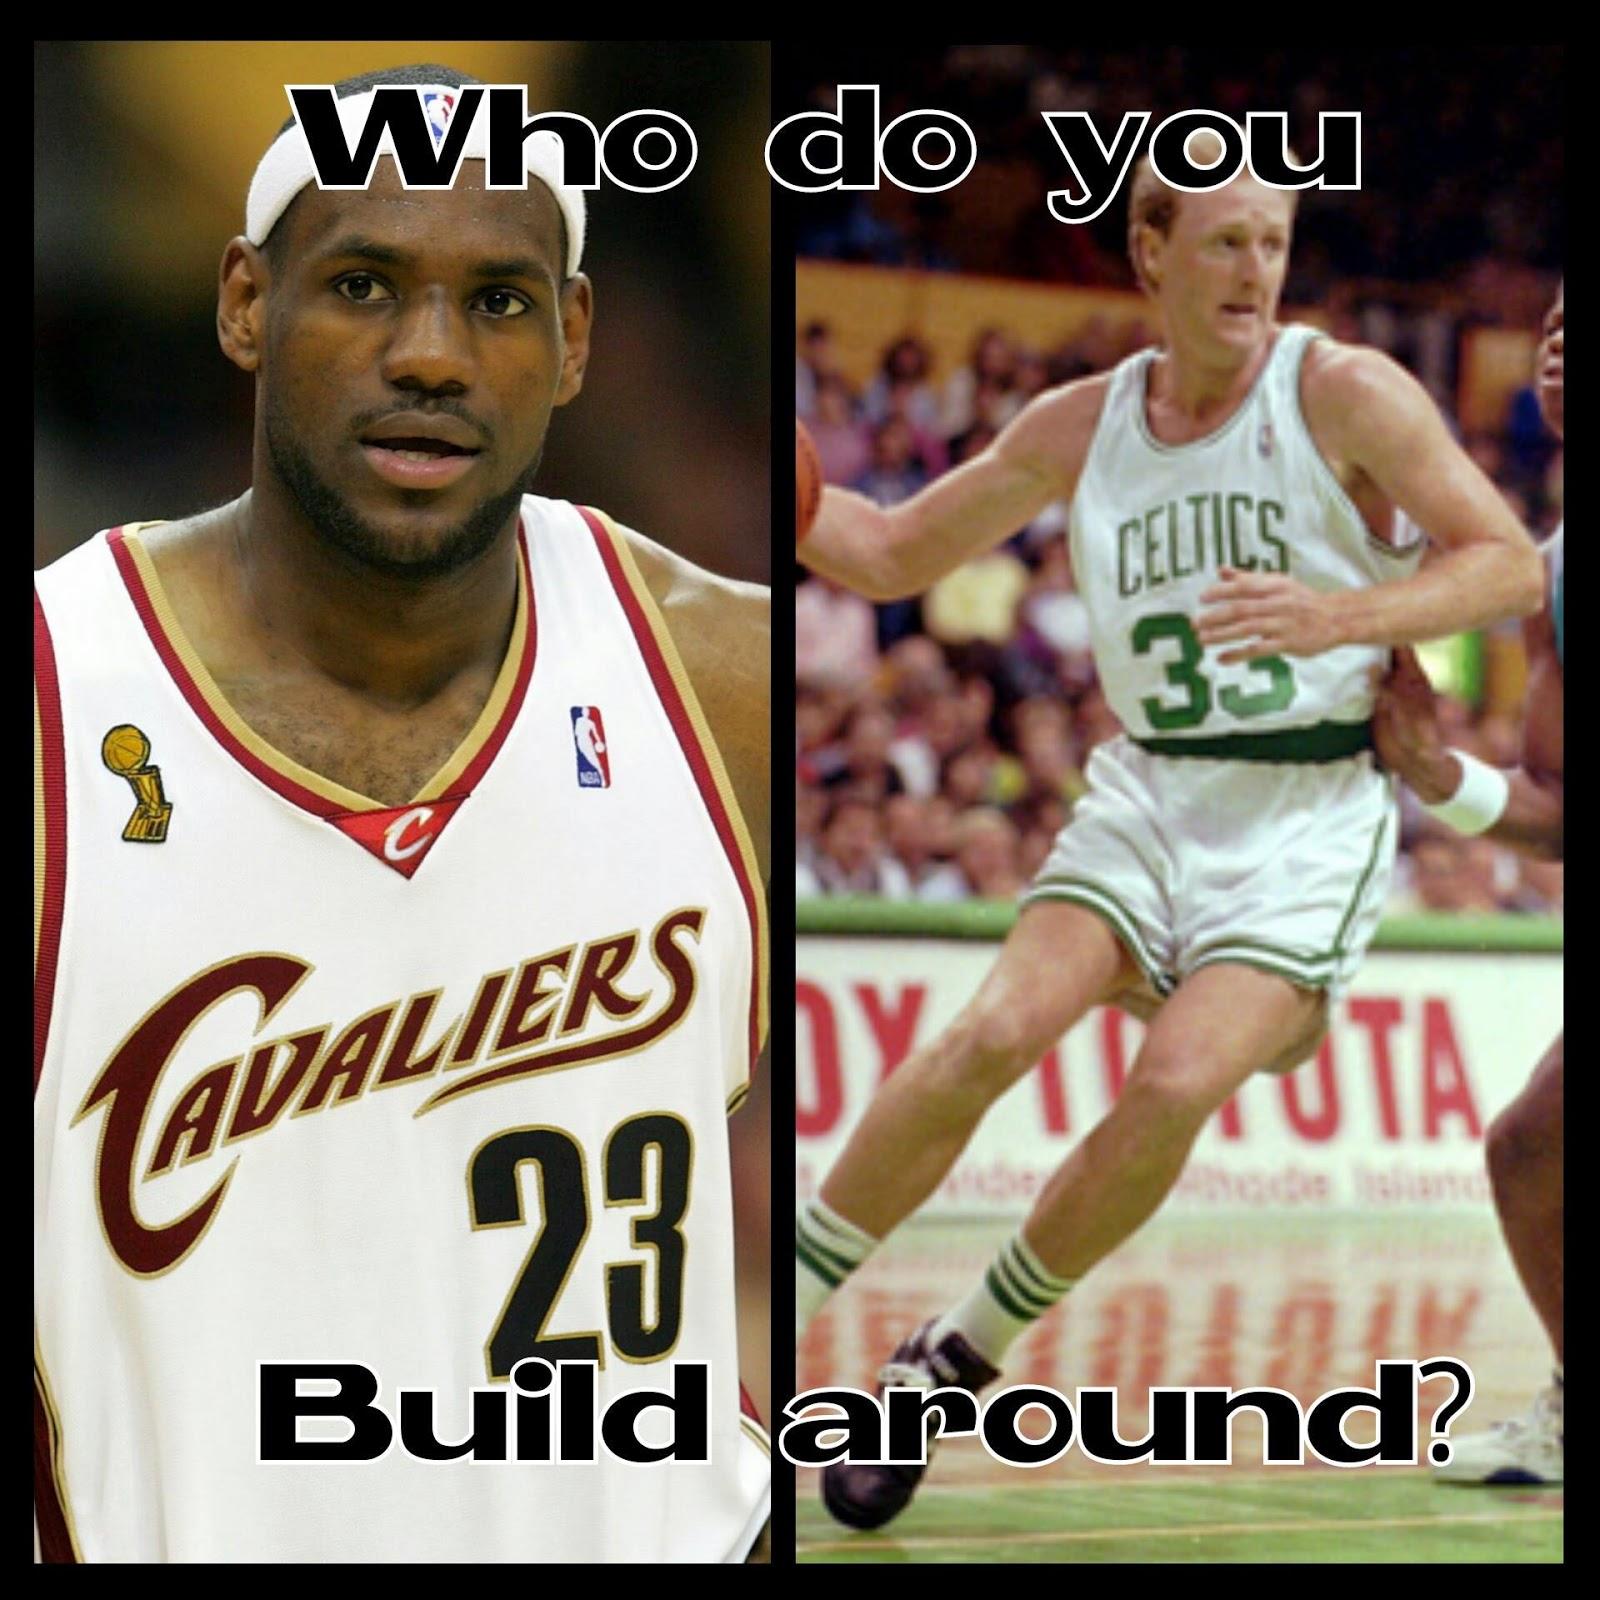 who do you build around?. - # LeBronJames #23 #Cavaliers #LarryBird #33 #Celtics